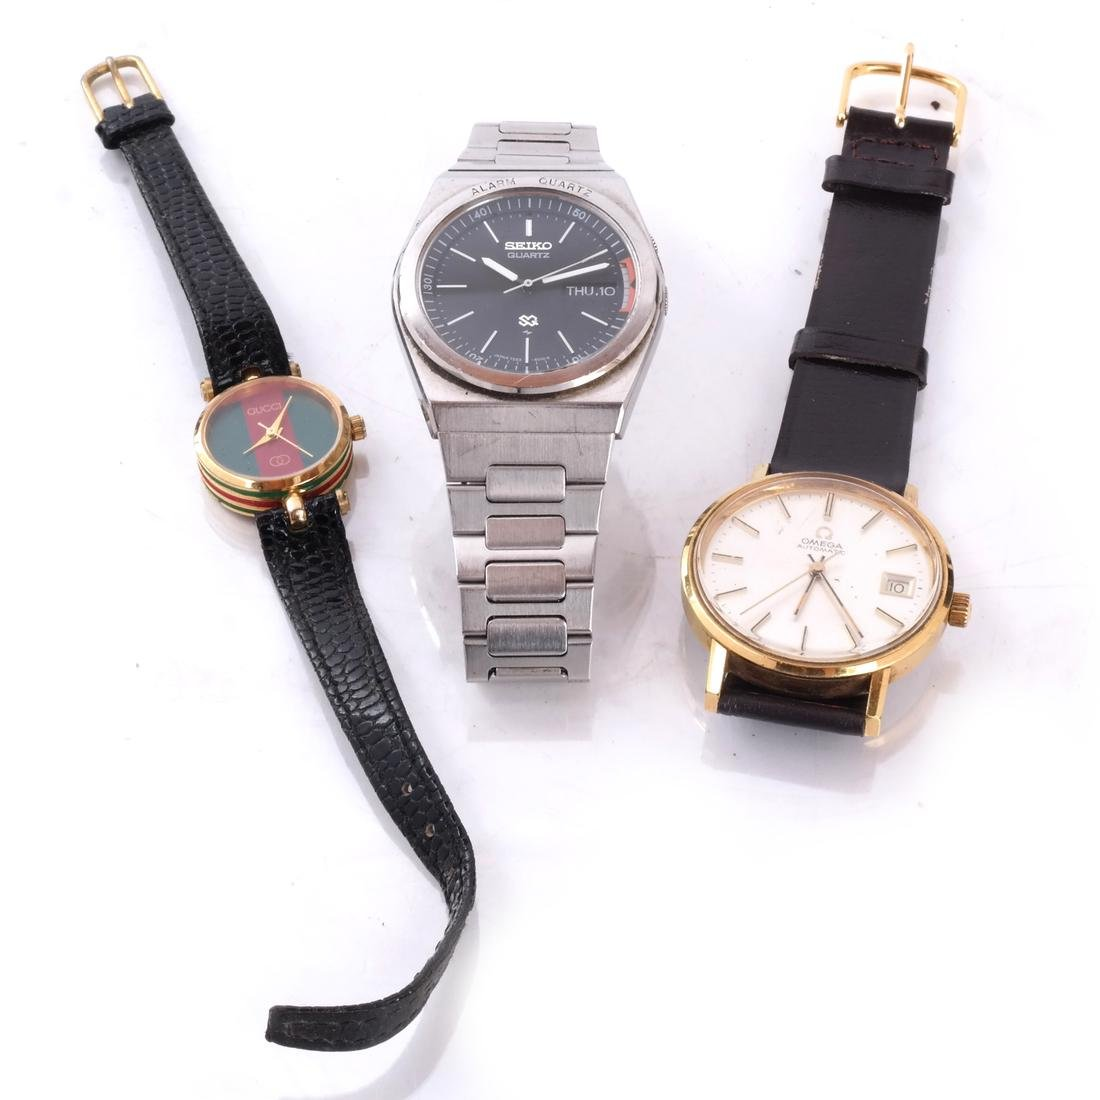 88825de2b Seiko, Omega & Gucci Quartz Watches - Nov 17, 2018 | Roland NY in NY